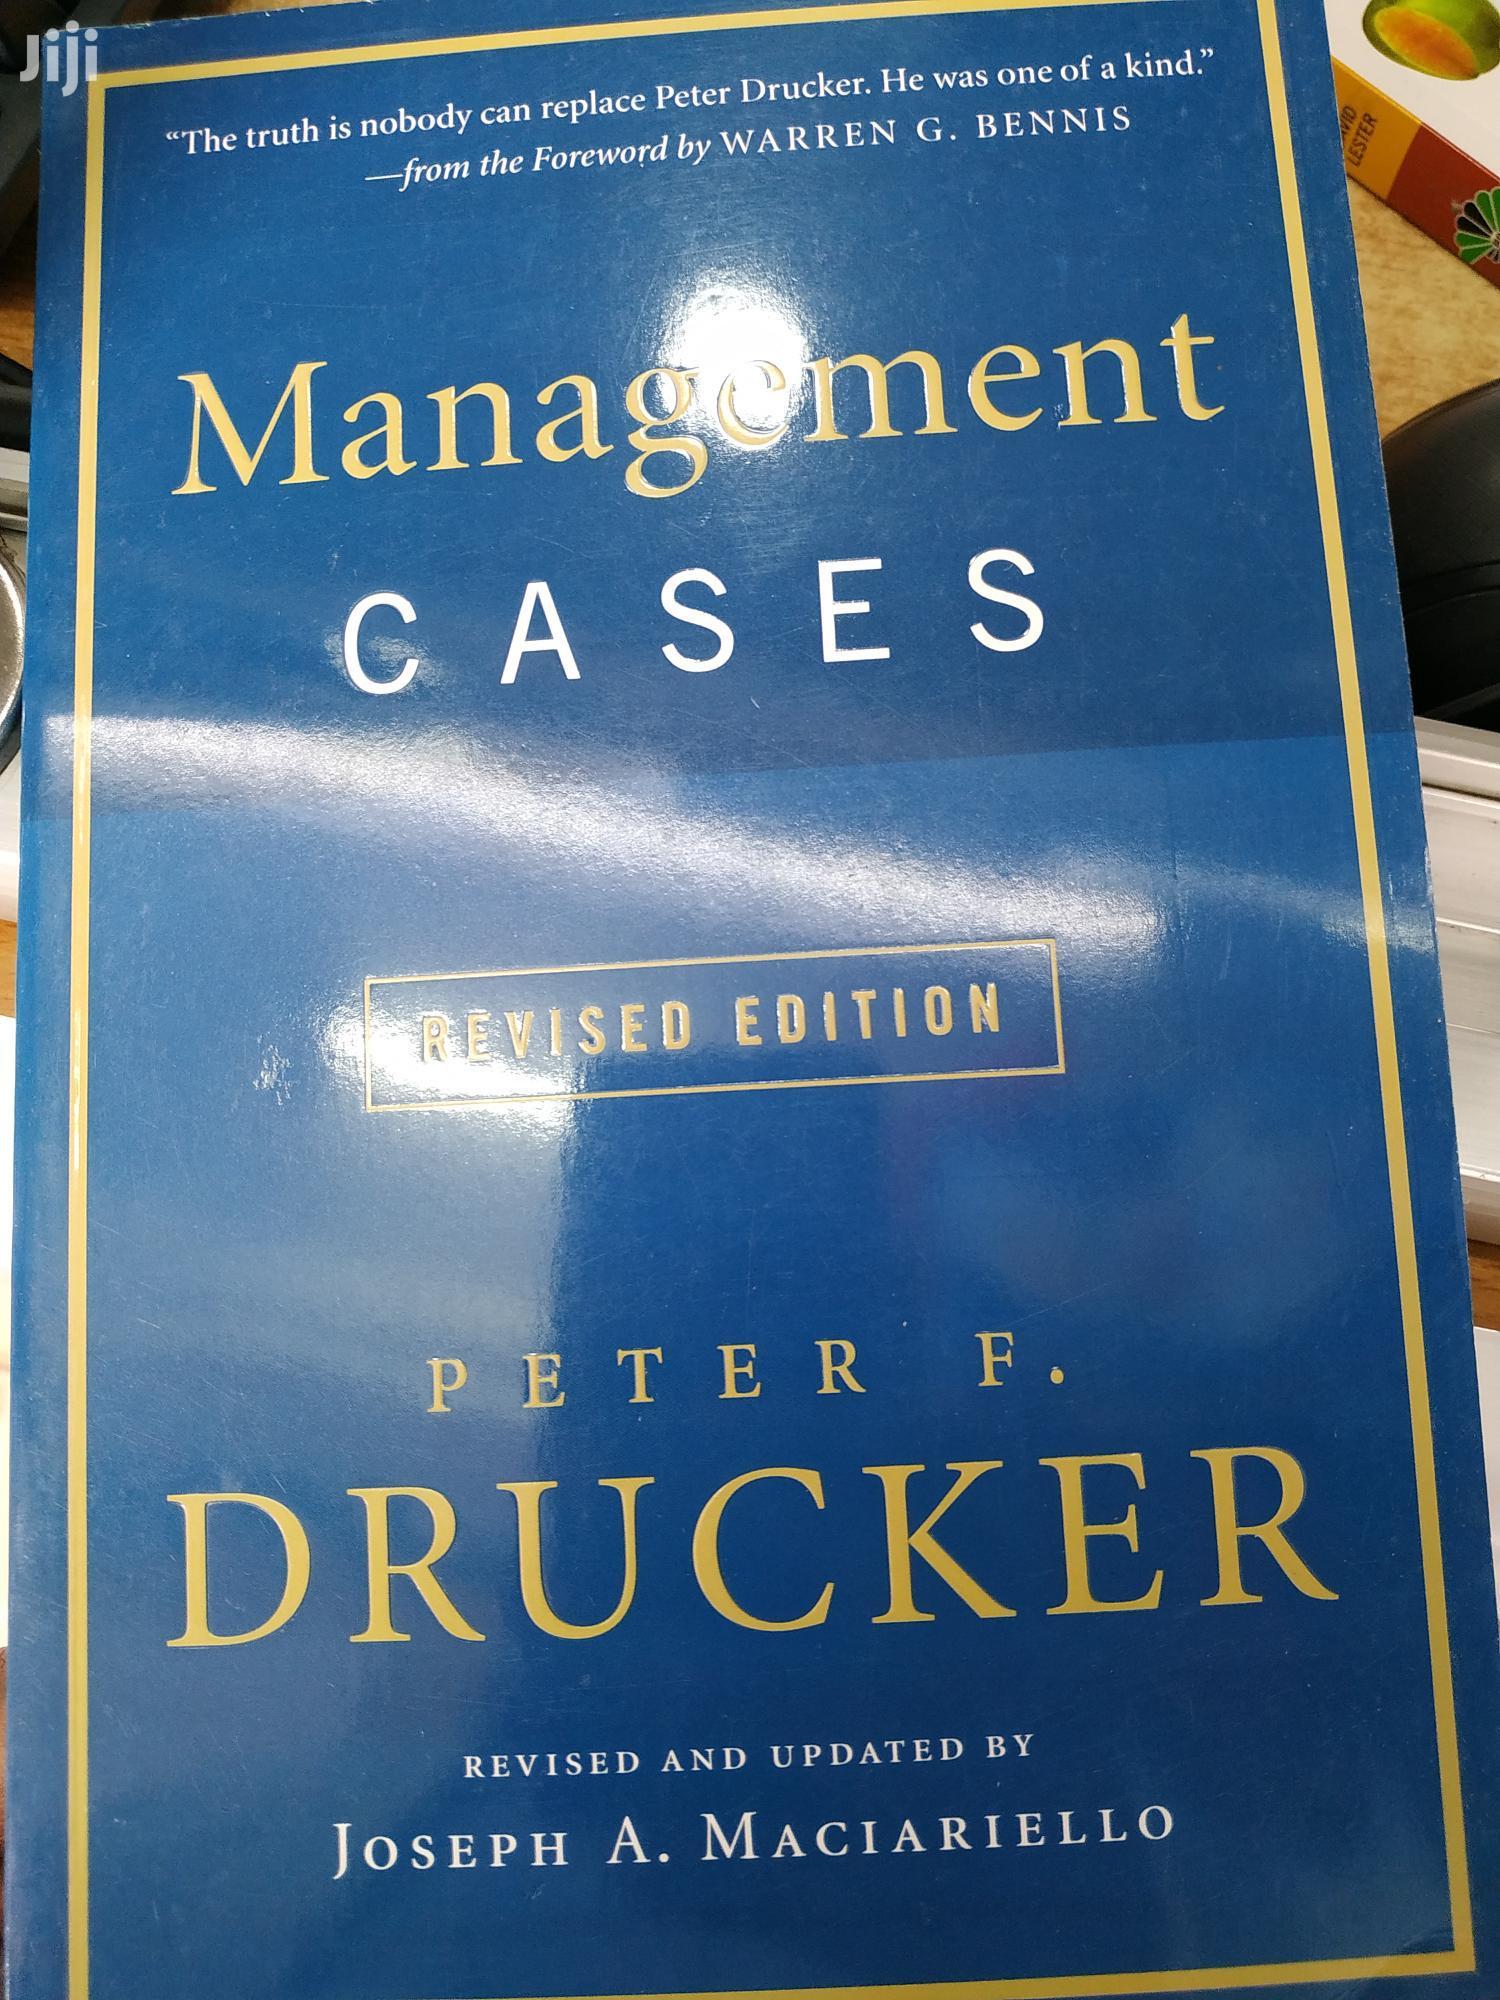 Management Cases - Peter Drucker